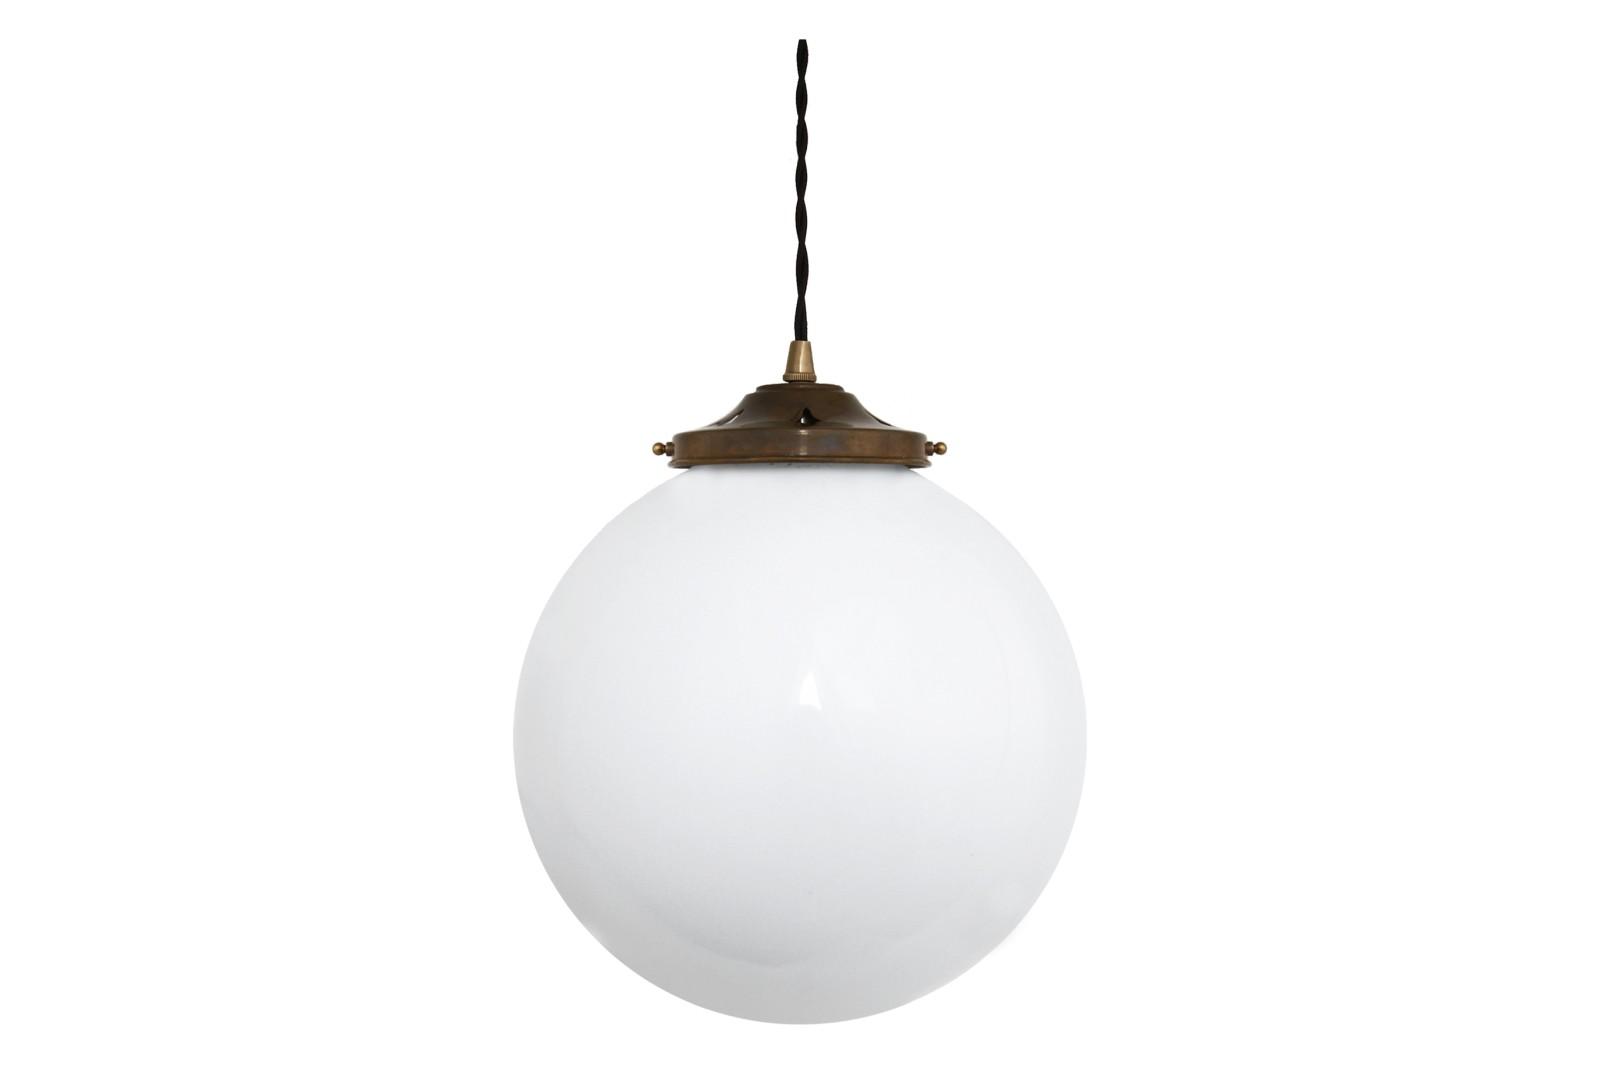 Gentry Opal Globe Pendant Light, 30cm Antique Brass